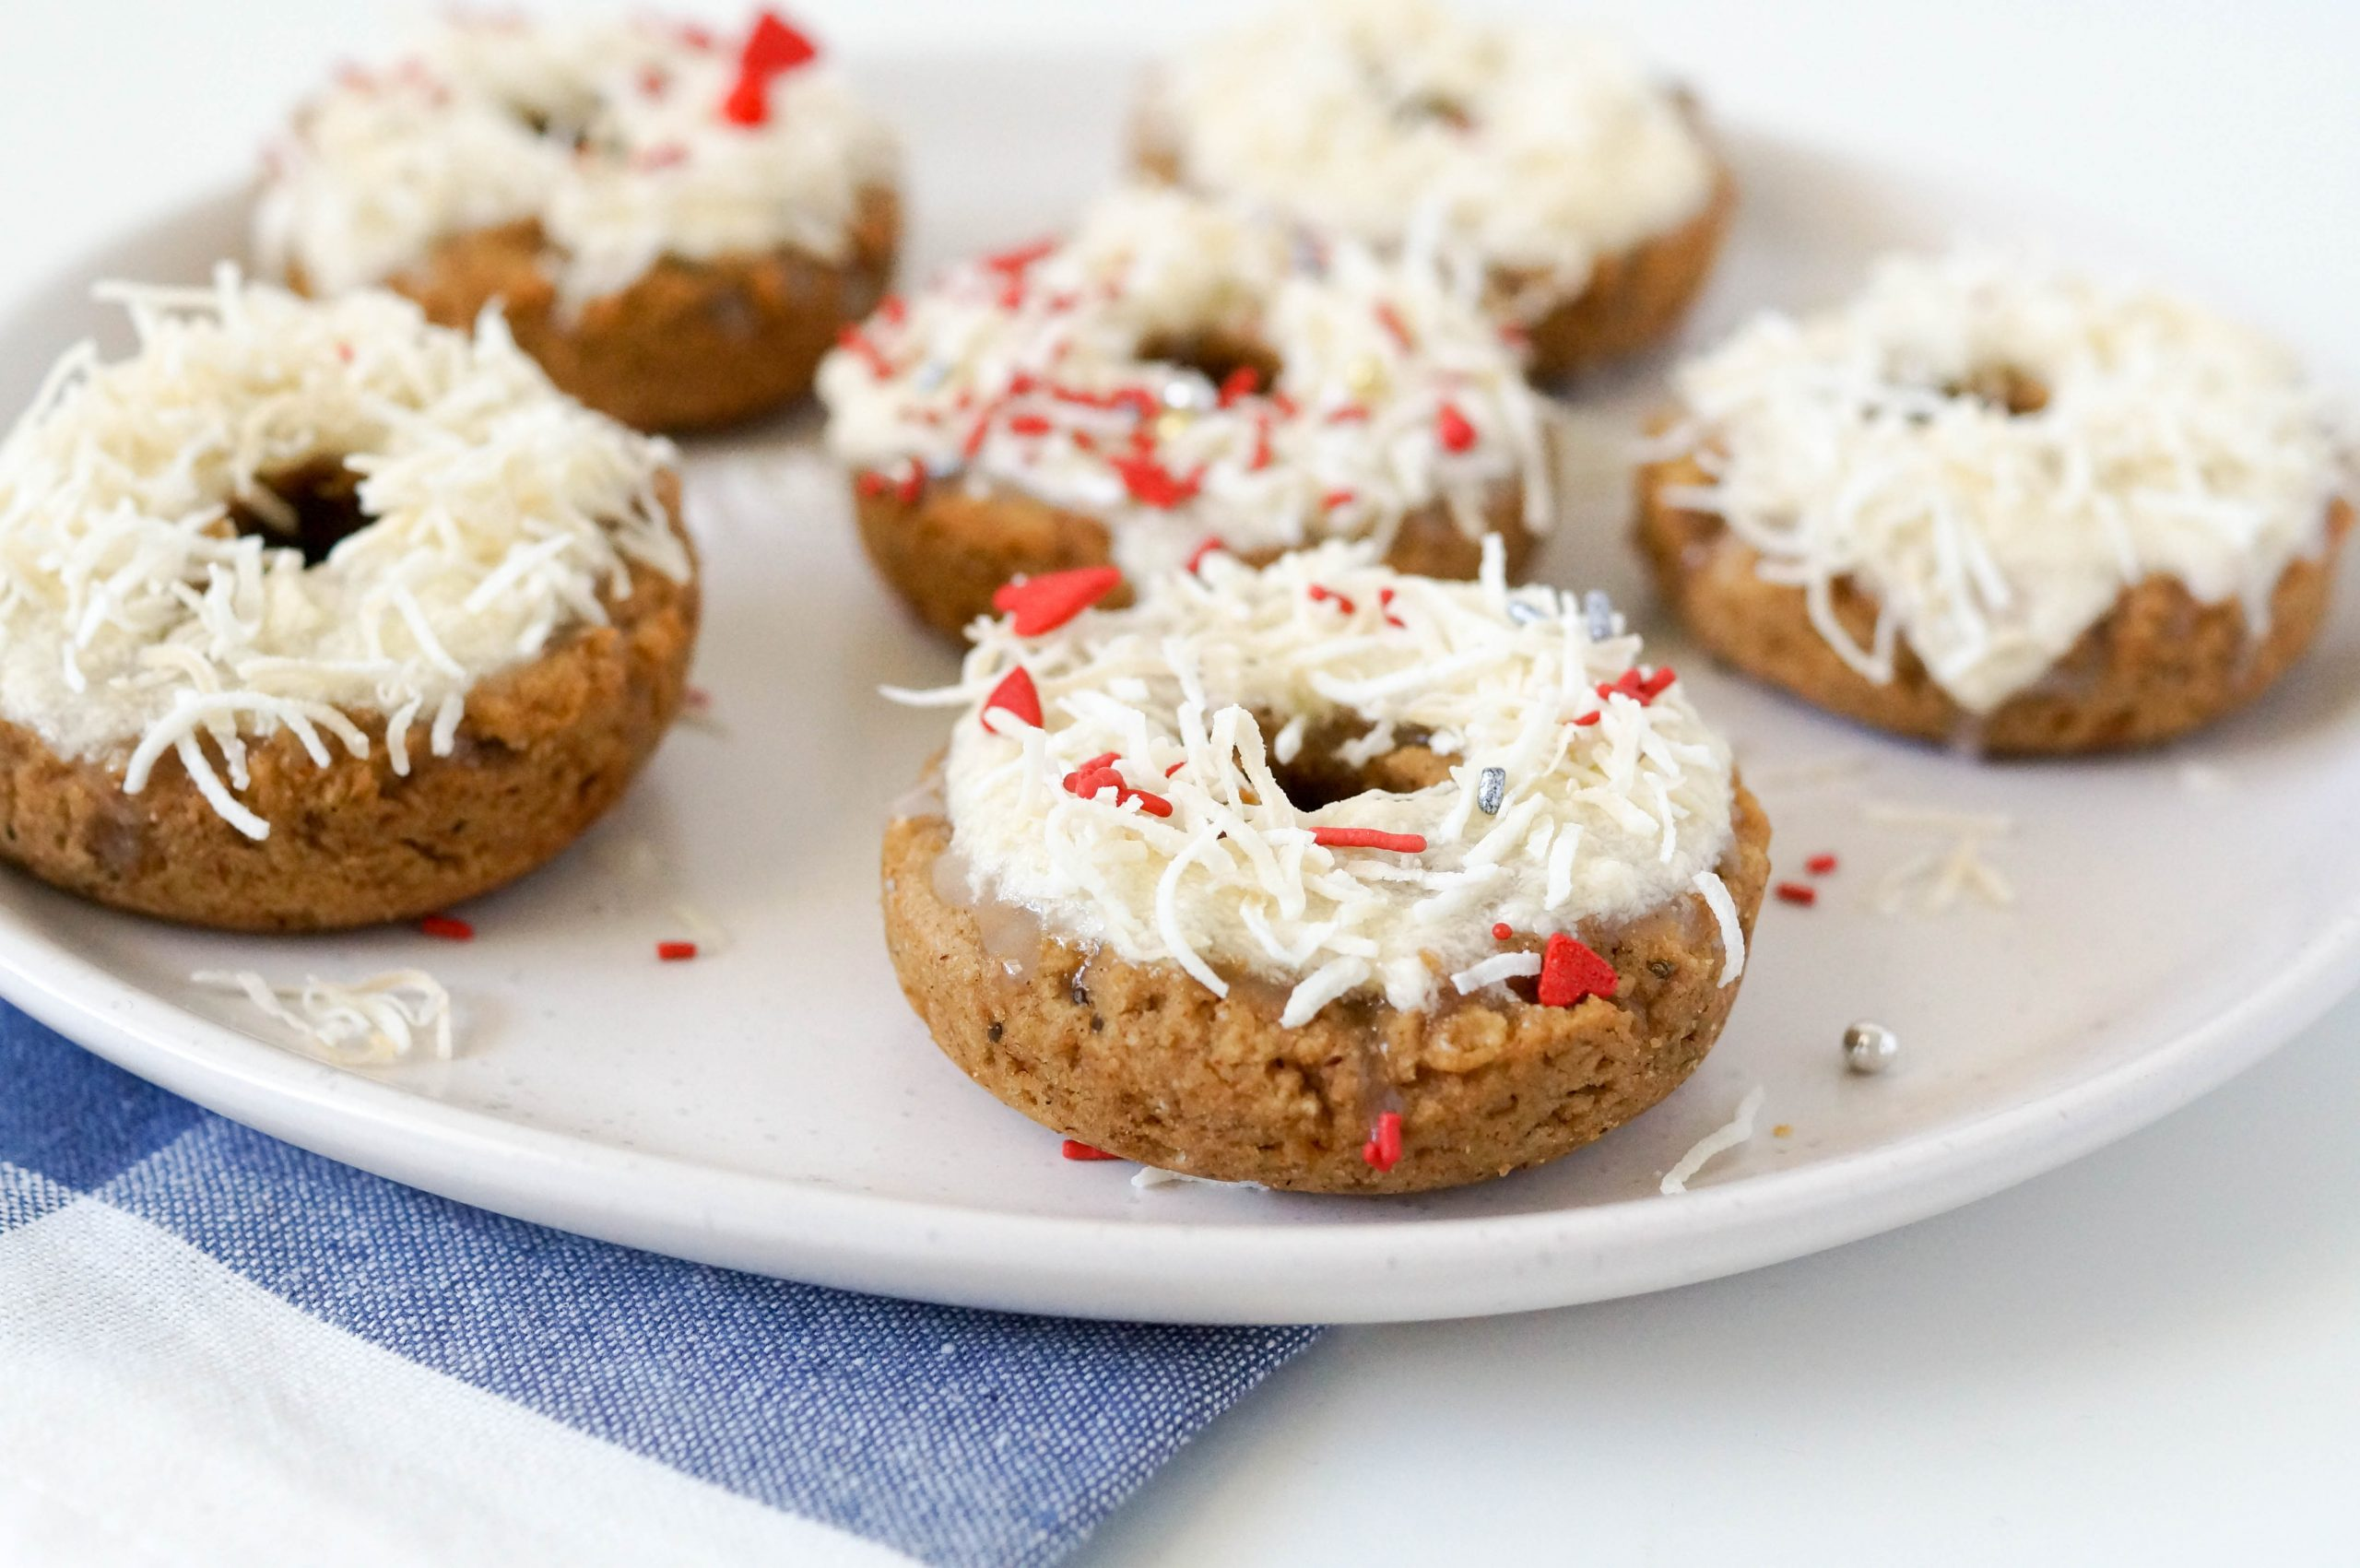 Vegan & Gluten-free Coconut Doughnuts